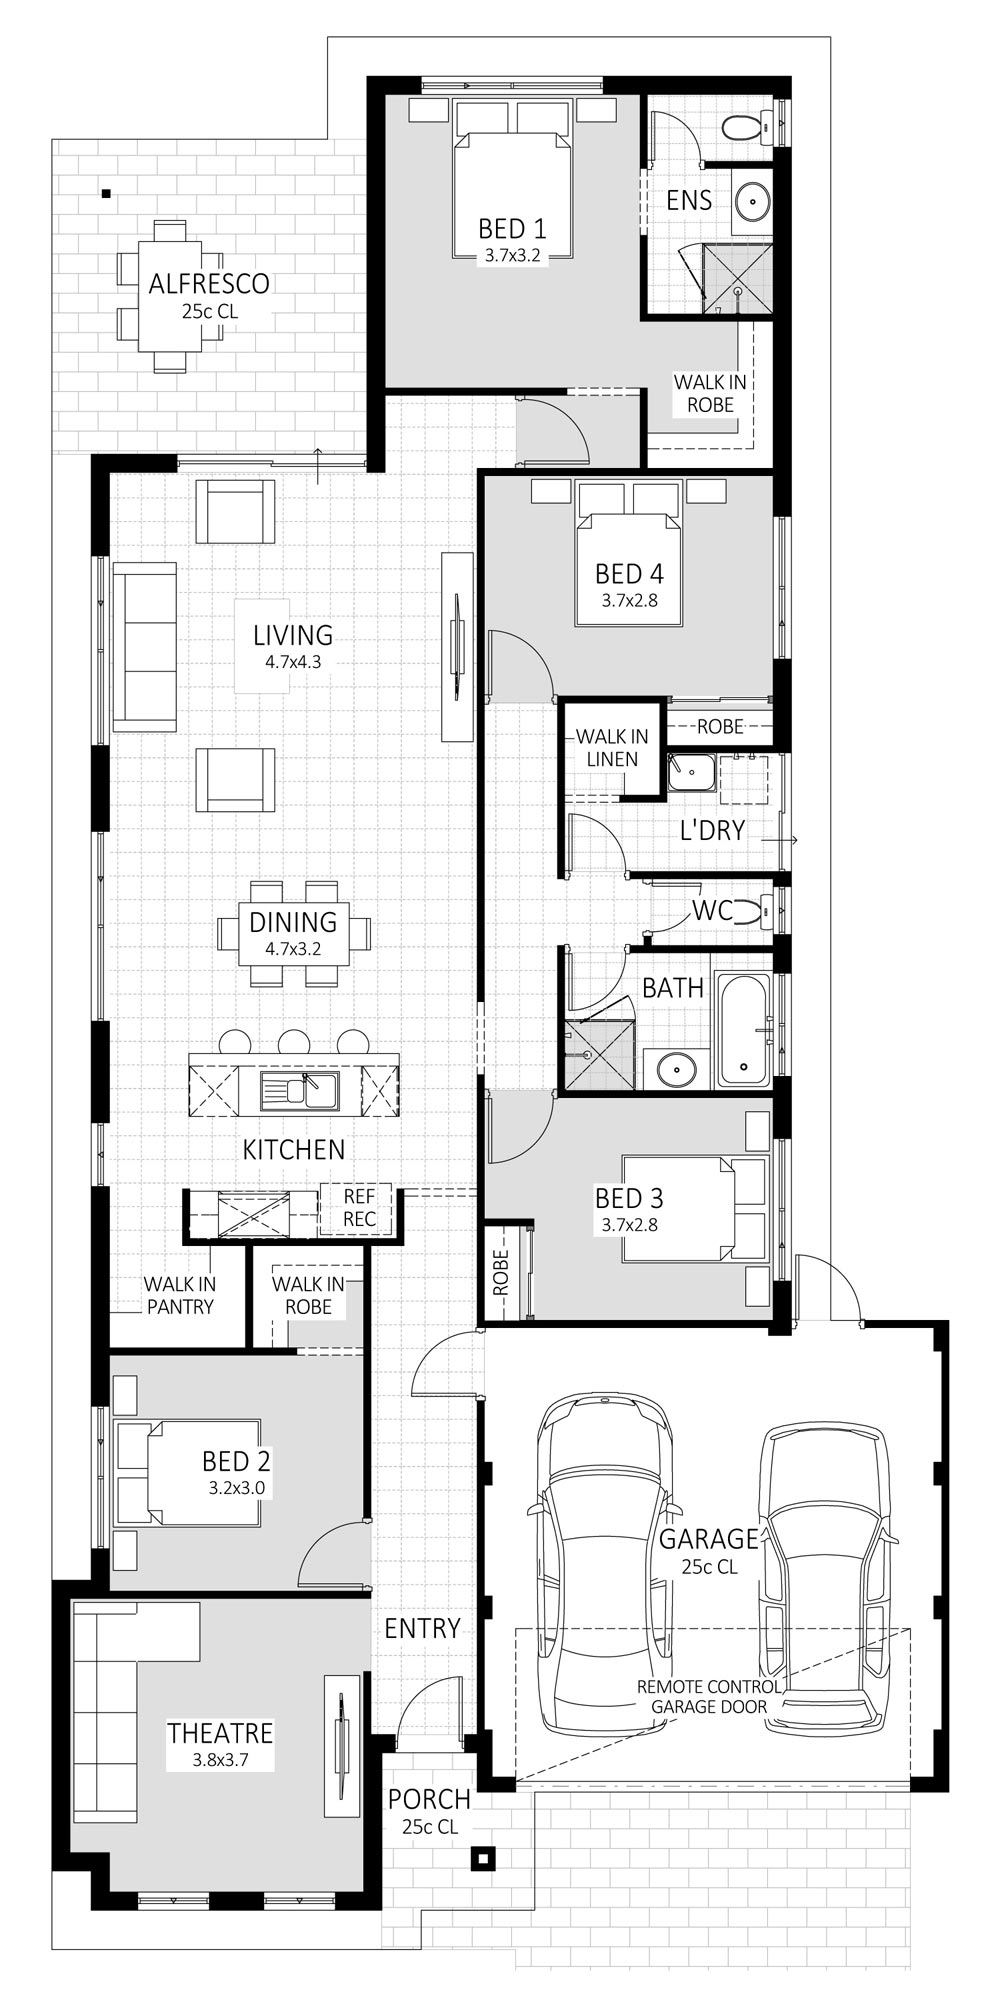 Prodigy floorplan